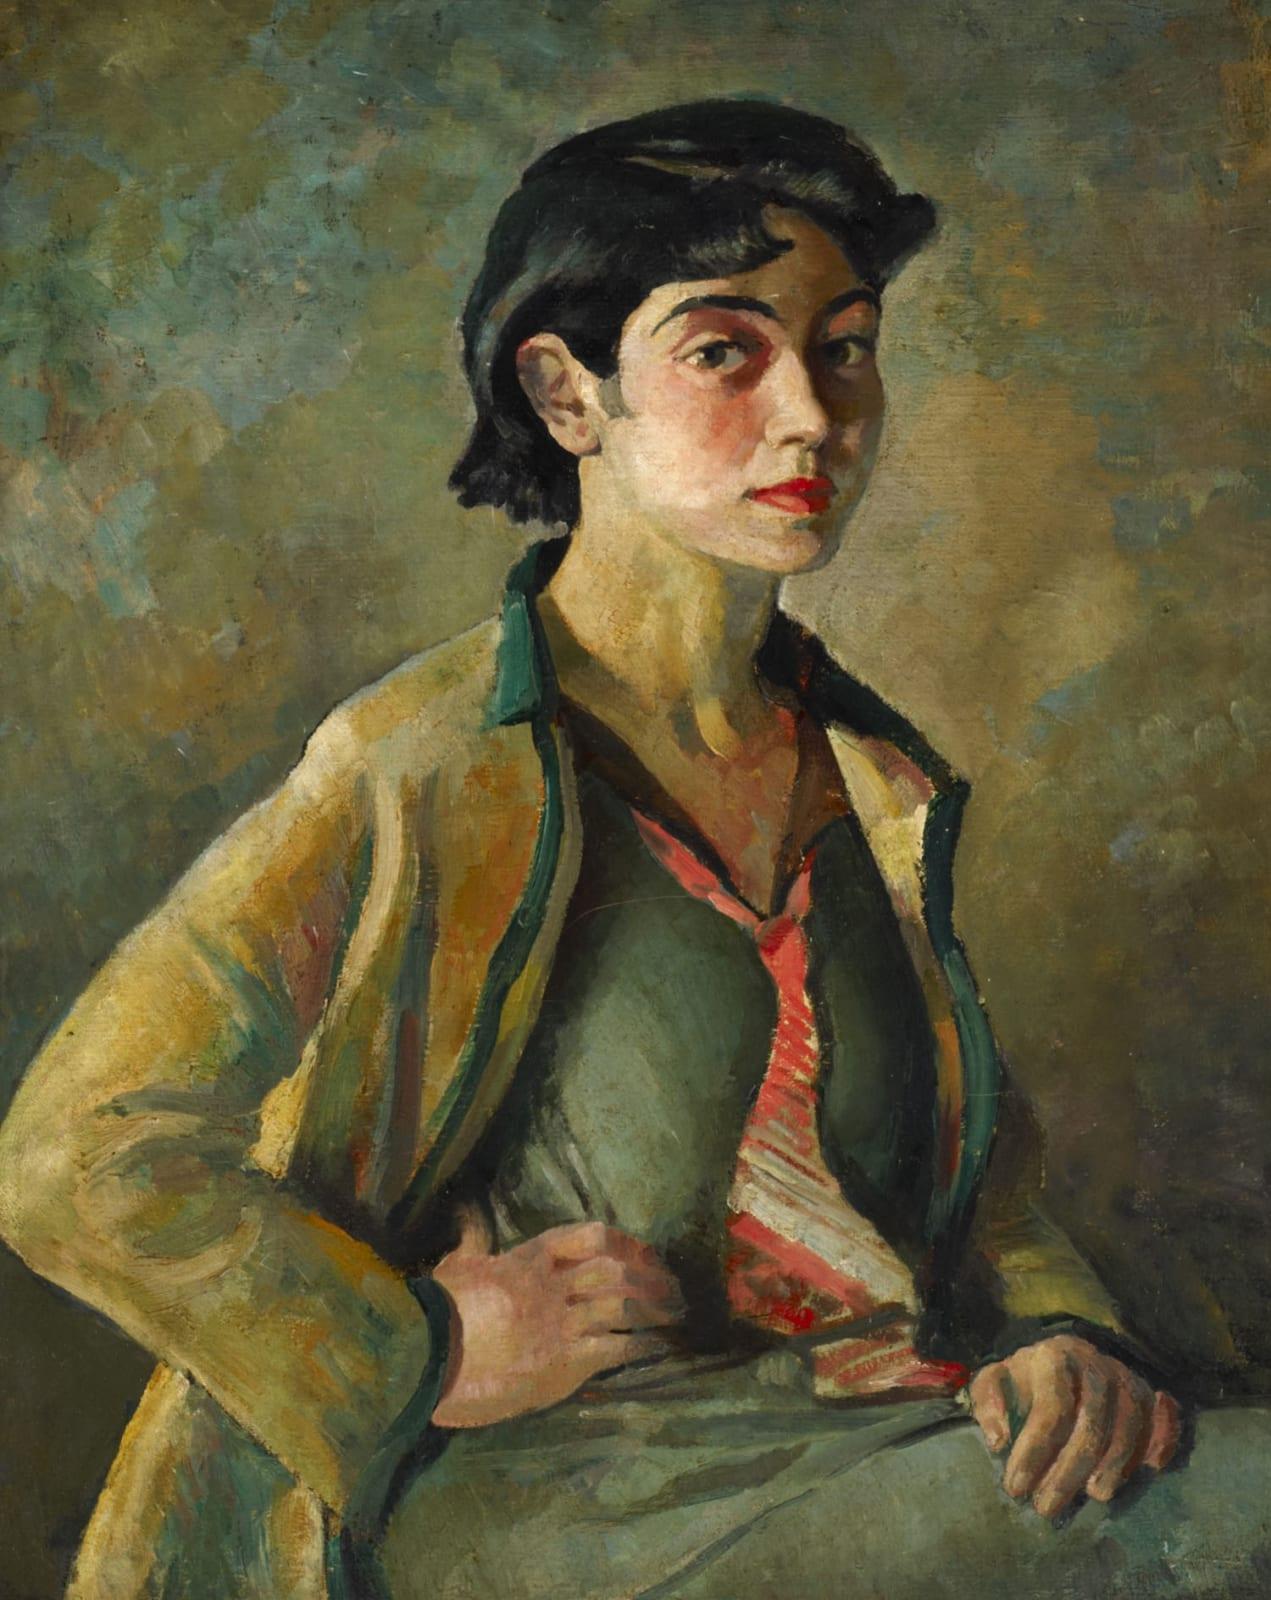 Emmanuel Levy (1900-1986) The Gold Jacket 1935 Oil on canvas 72 x 58 cm Ben Uri Collection © Emmanuel Levy estate